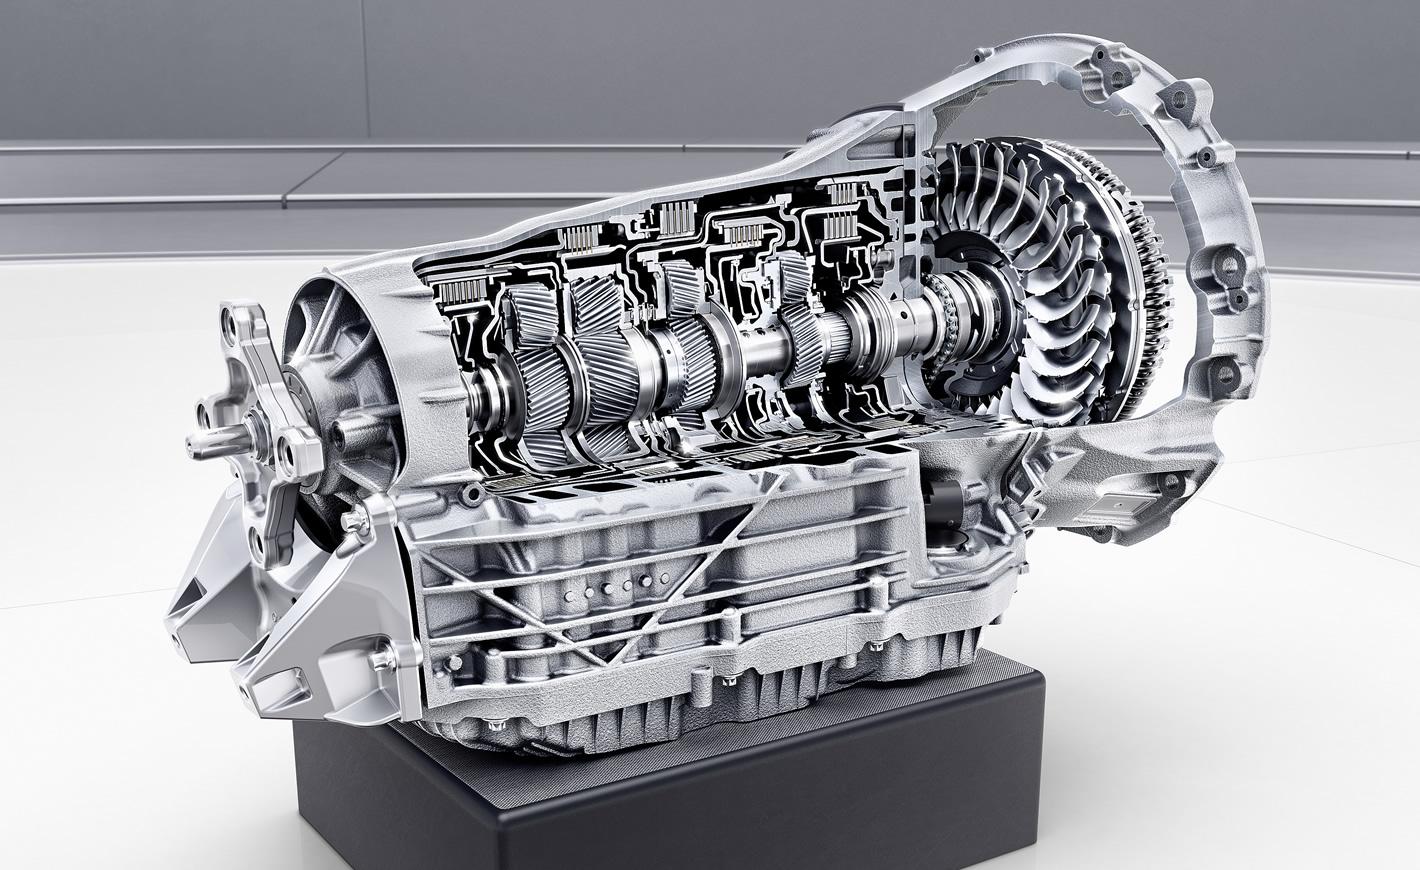 Mercedes-Benz GLE 450 4Matic EQ Boost - skrzynia biegów 9G-Tronic